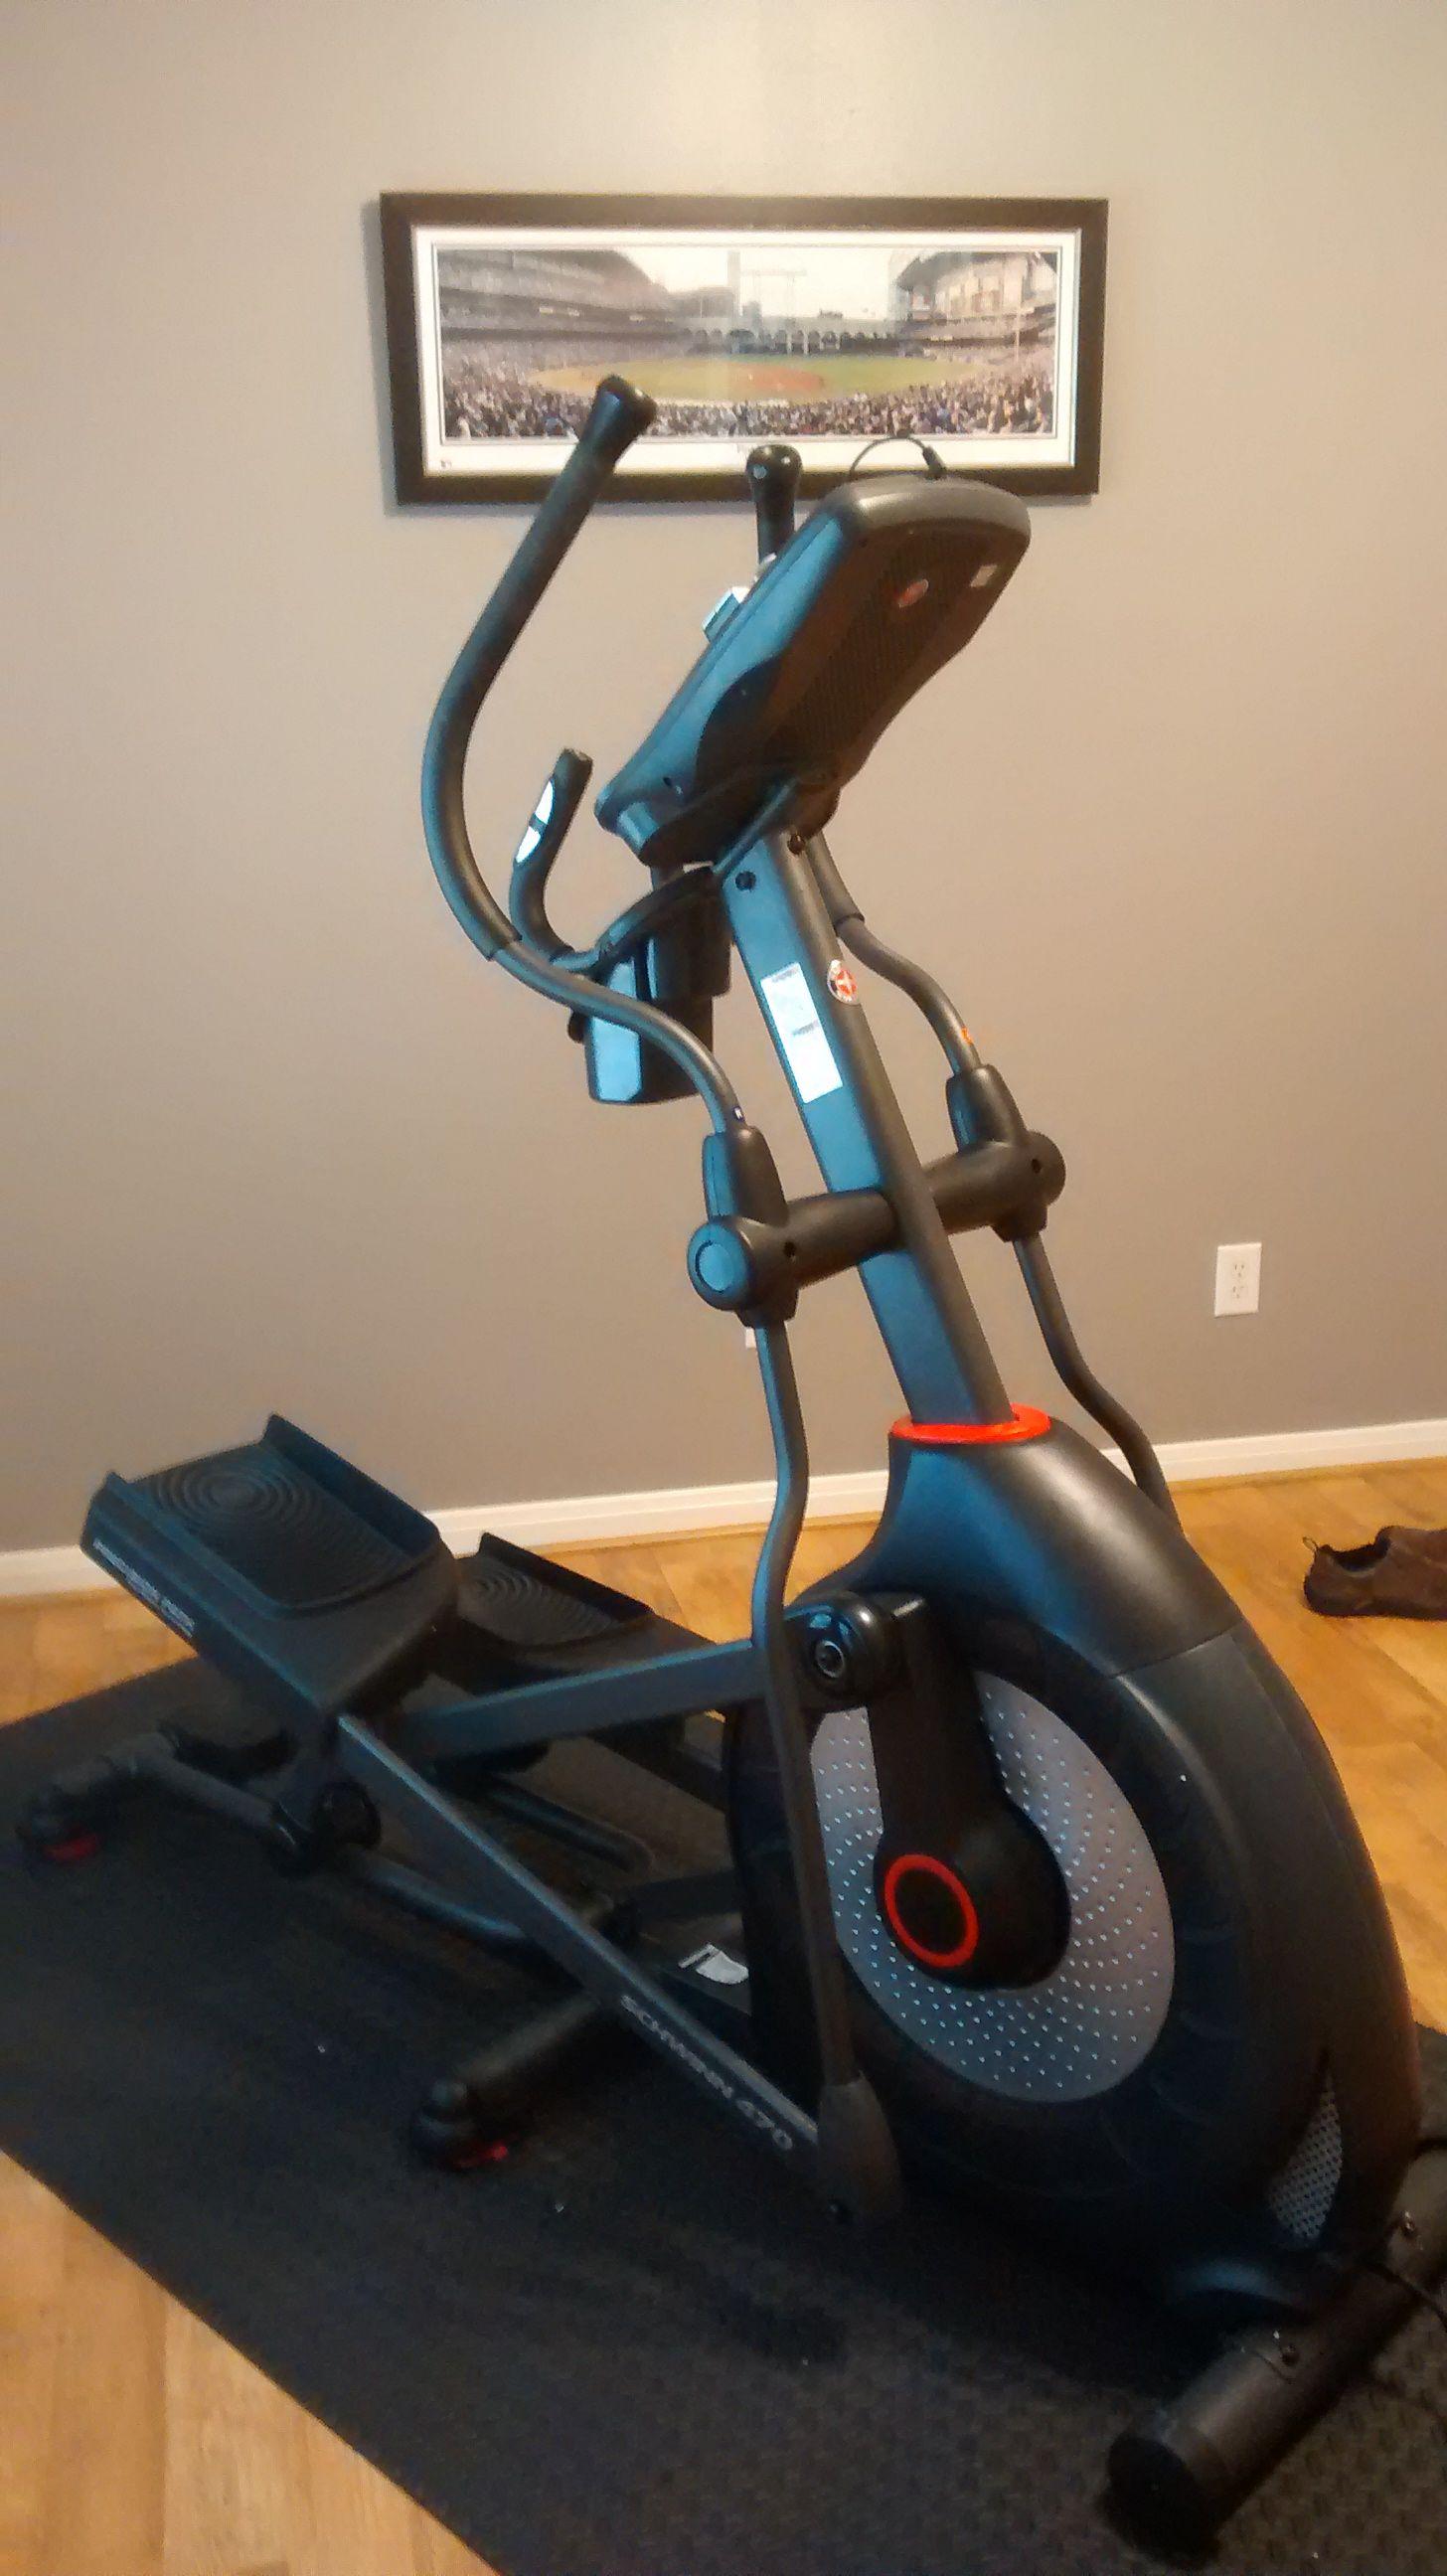 Schwinn Elliptical Assembled In Houston Texas Gymlife At Home Gym Gym Life No Equipment Workout